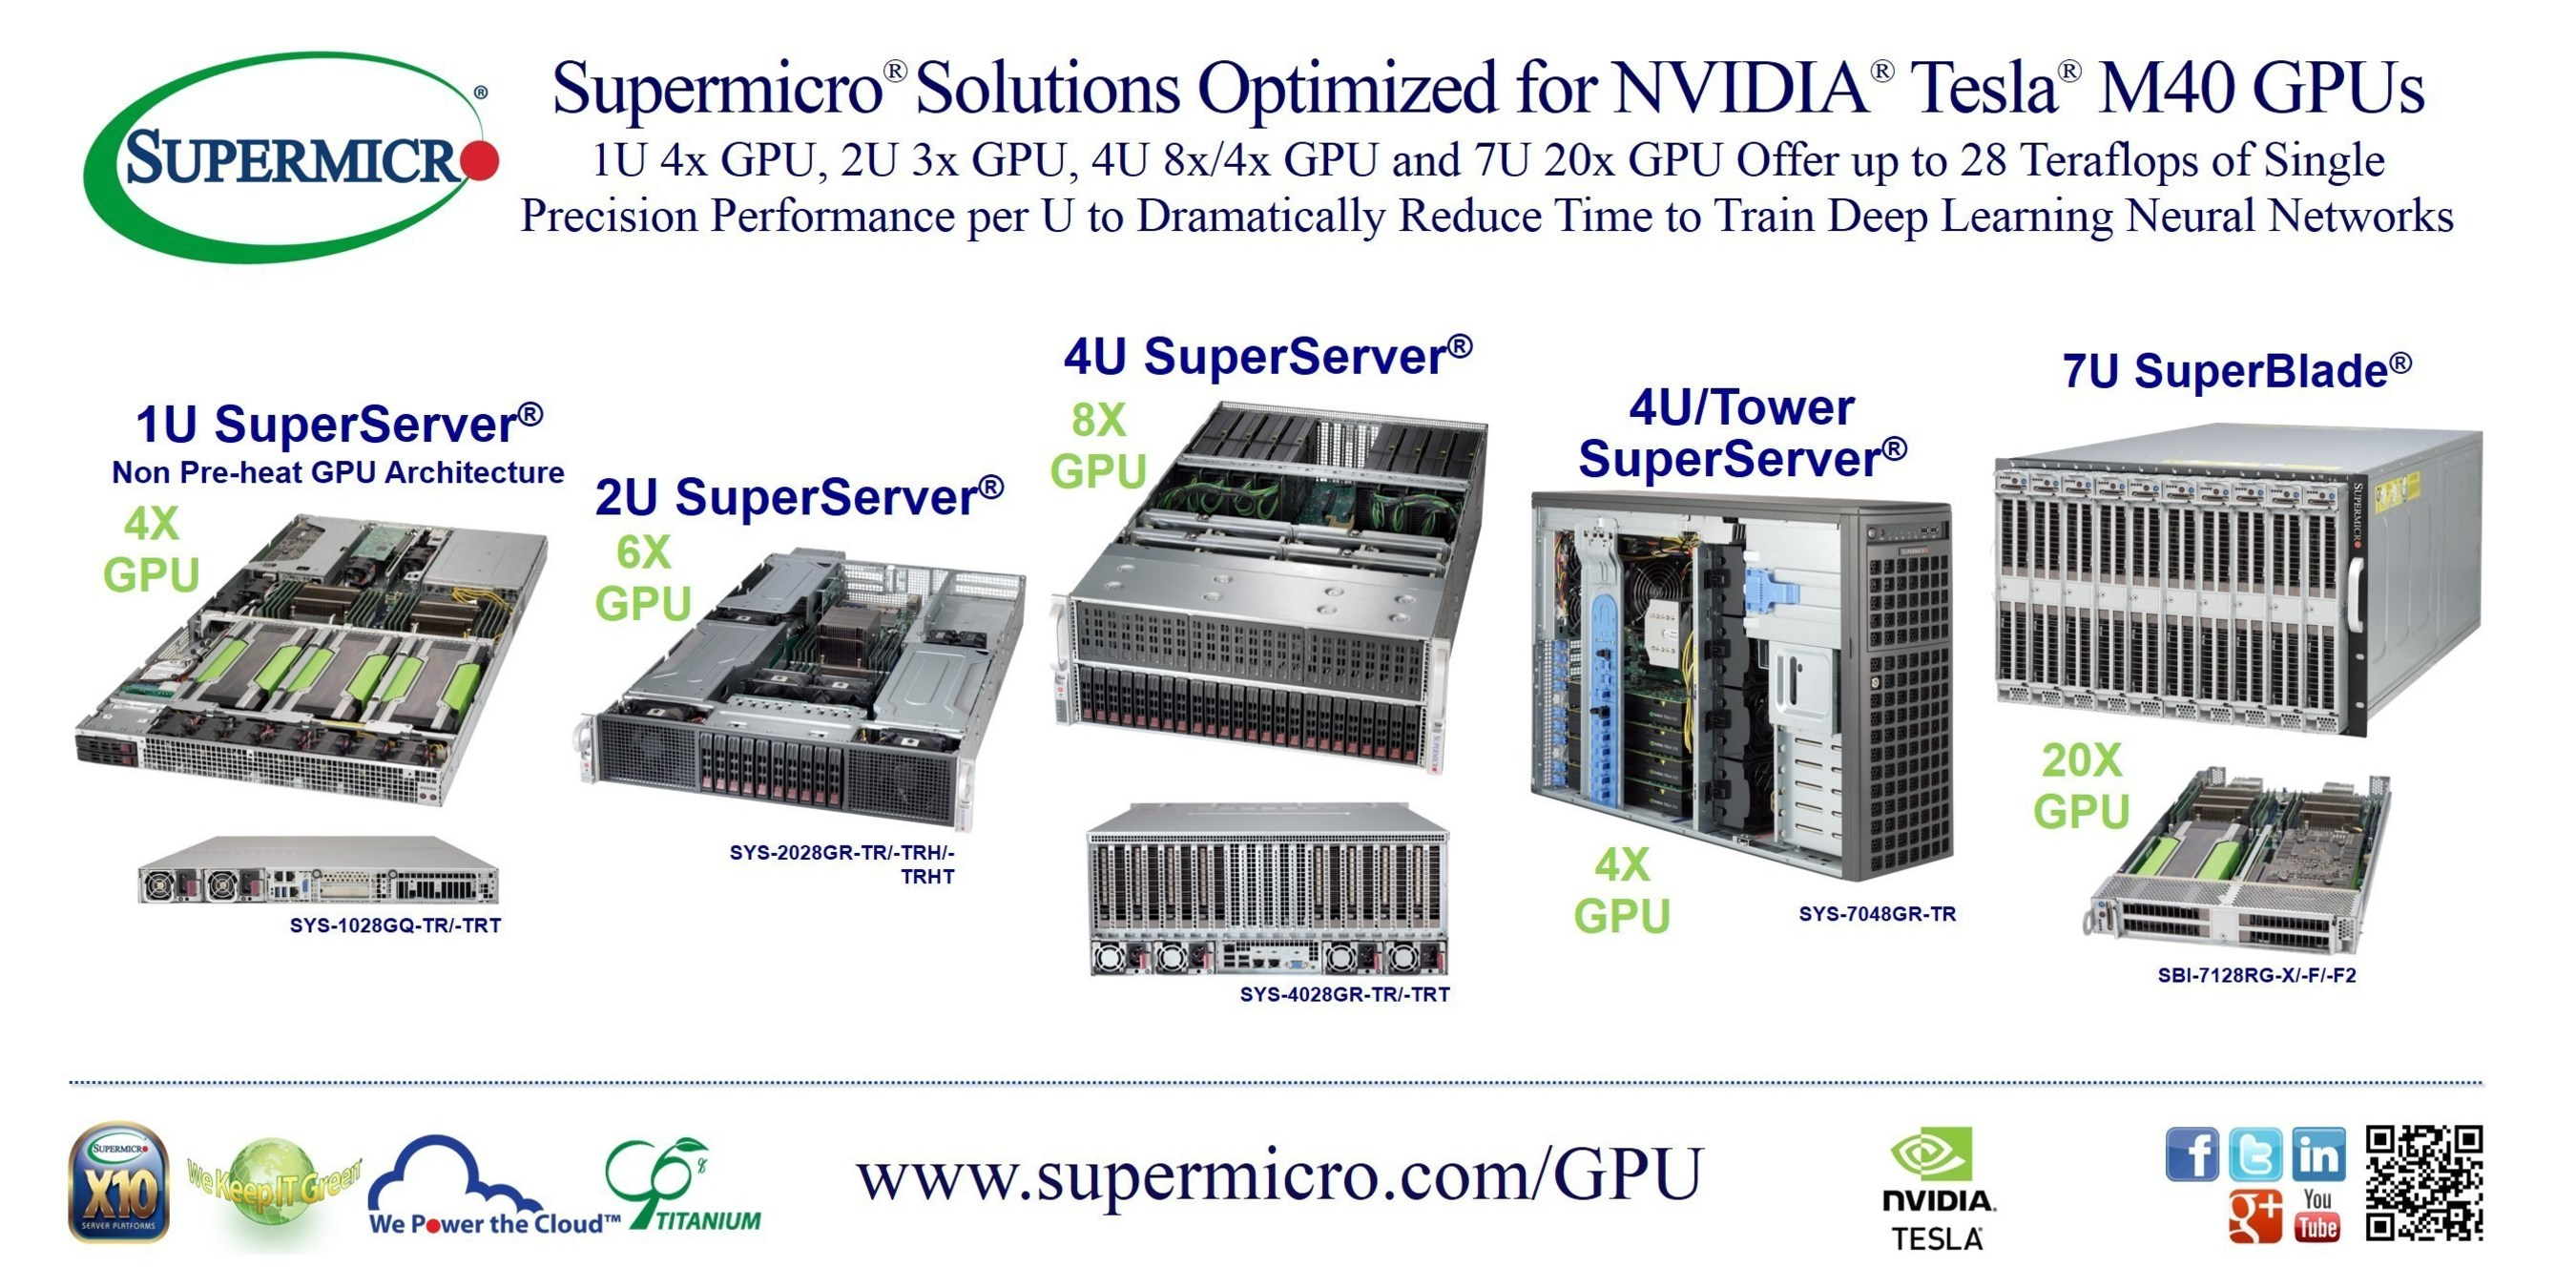 Supermicro® 1U-4U GPU SuperServers and 7U SuperBlade® Maximize